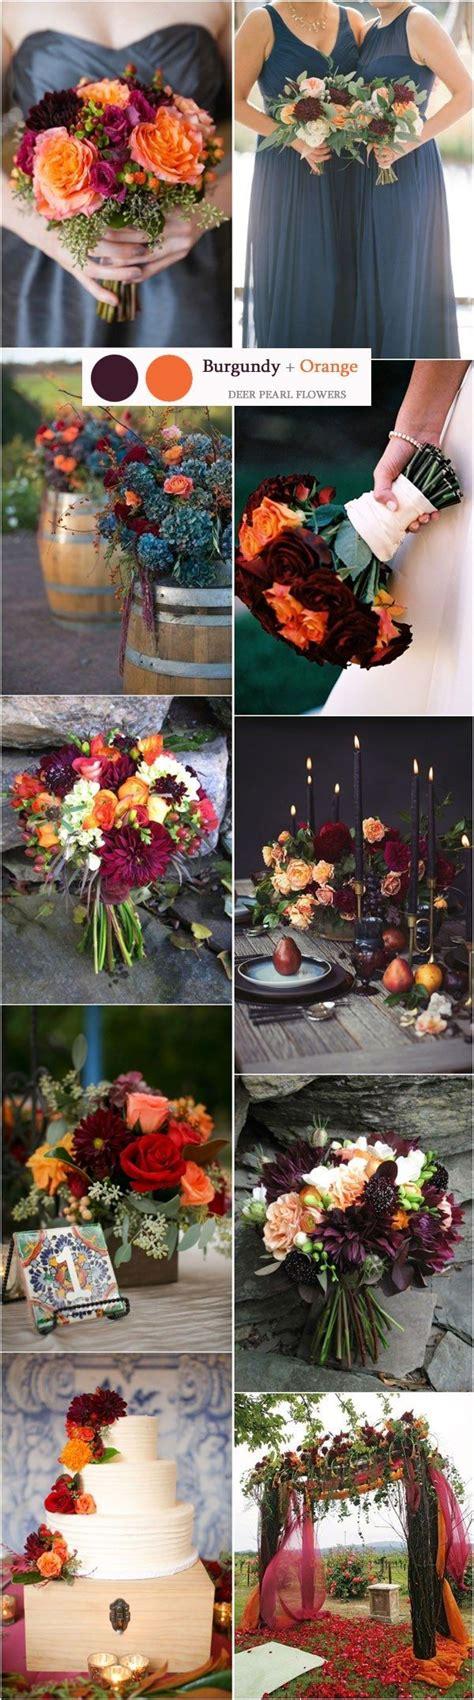 7 Ideas For A Fall Wedding by Best 25 Fall Wedding Arches Ideas On